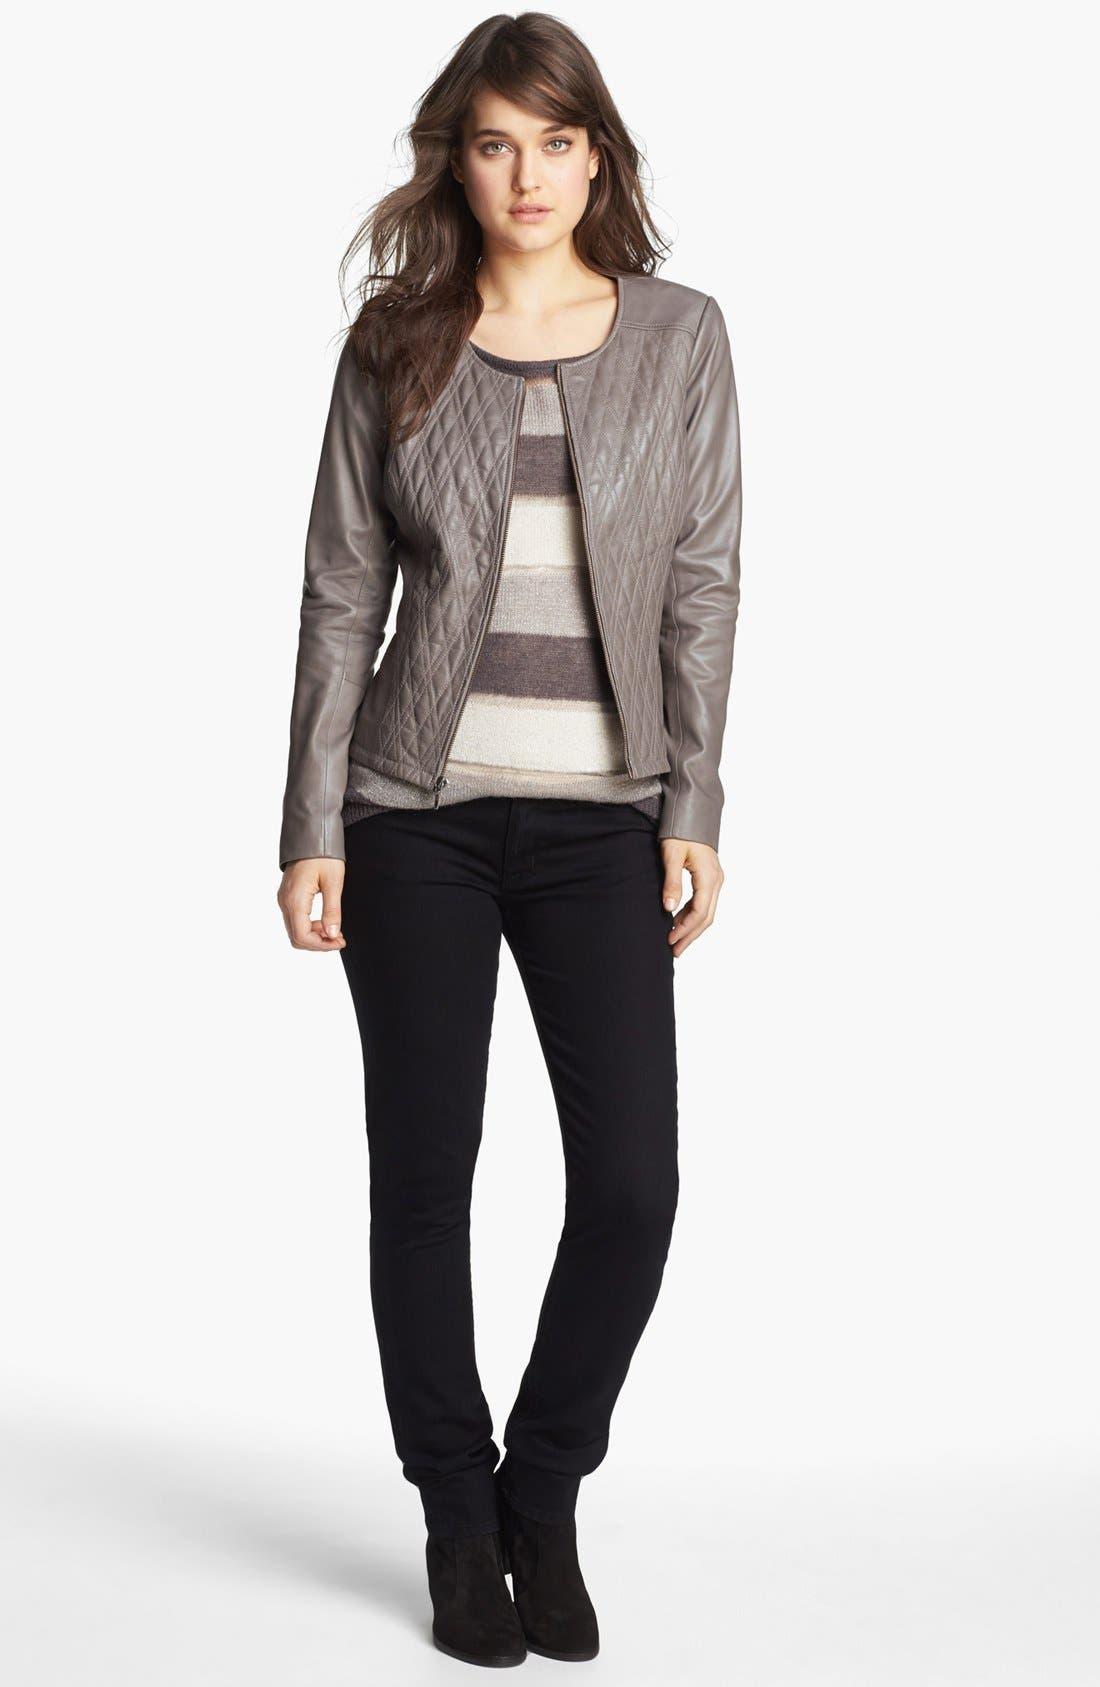 Main Image - Hinge Jacket, Sweater & Hudson Jeans Skinny Jeans